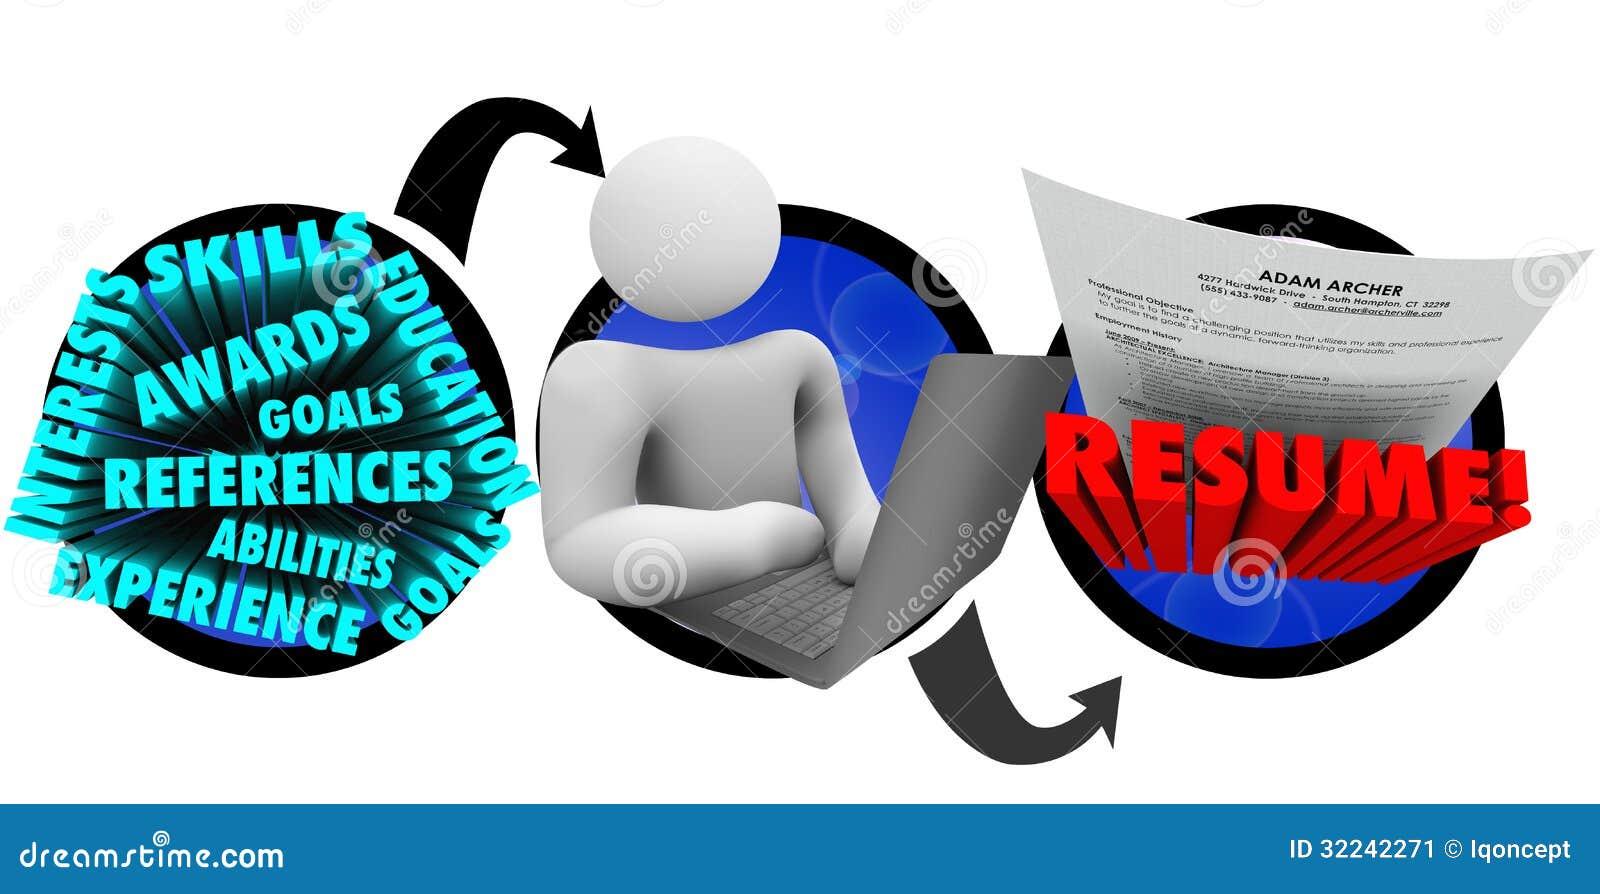 Person Creating Resume Steps How para escribir el mejor documento